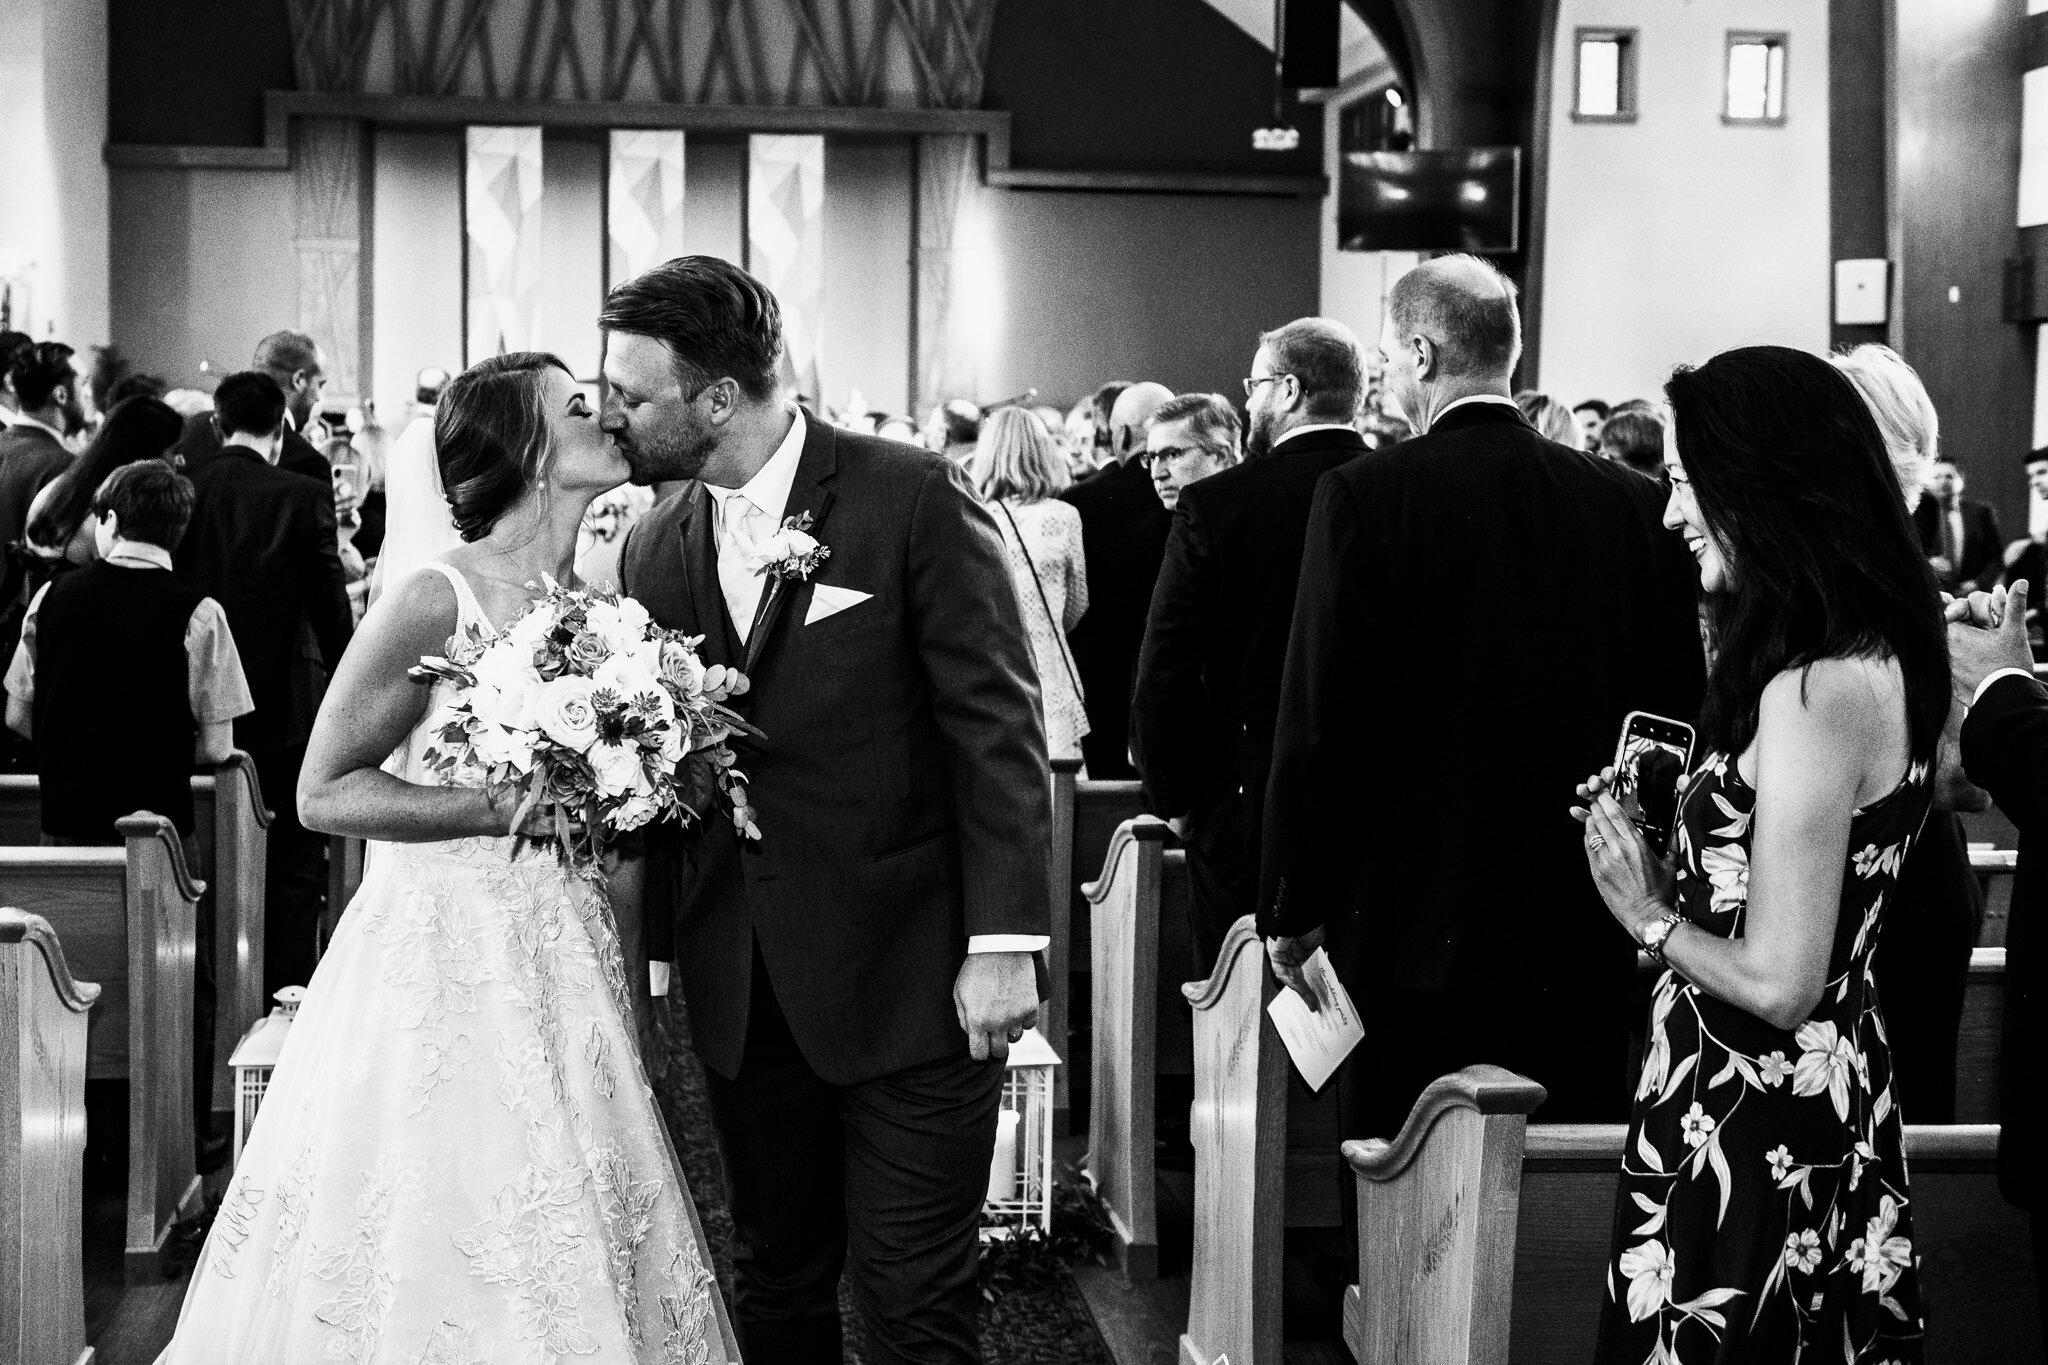 Coyle-Forsgate-Country-Club-Wedding-Photographer-15.JPG